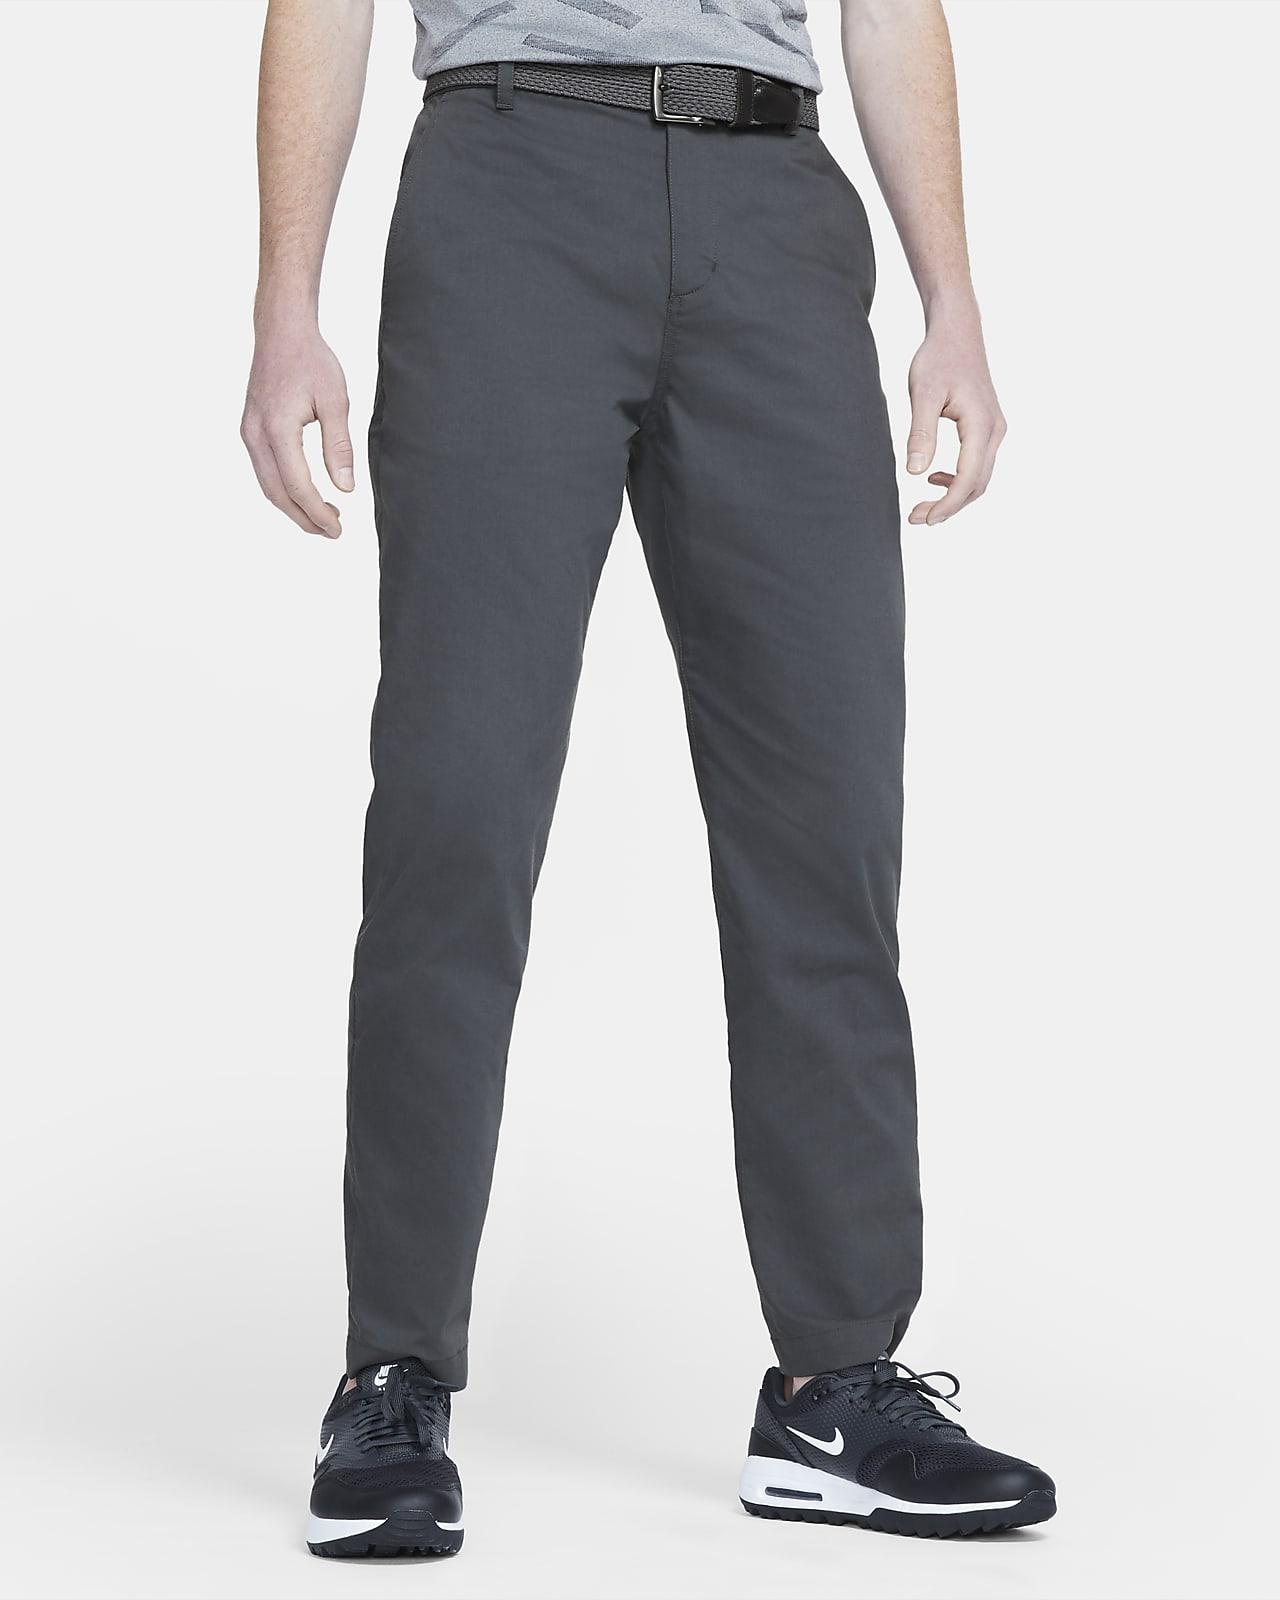 Nike Dri-FIT UV normál fazonú férfi chino golfnadrág